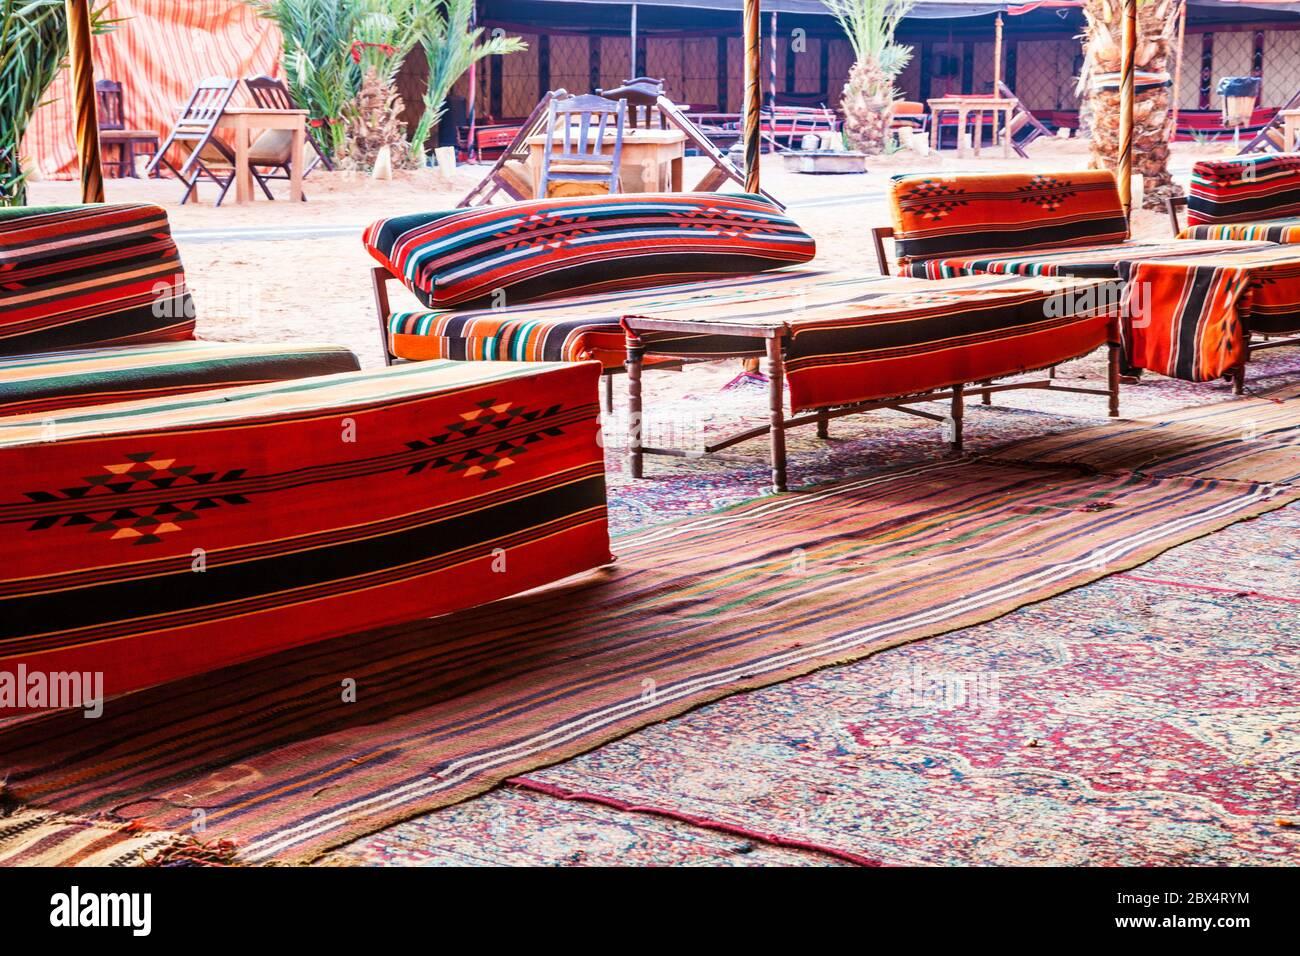 A tourist bedouin camp in the Jordanian desert at Wadi Rum near Petra. Stock Photo